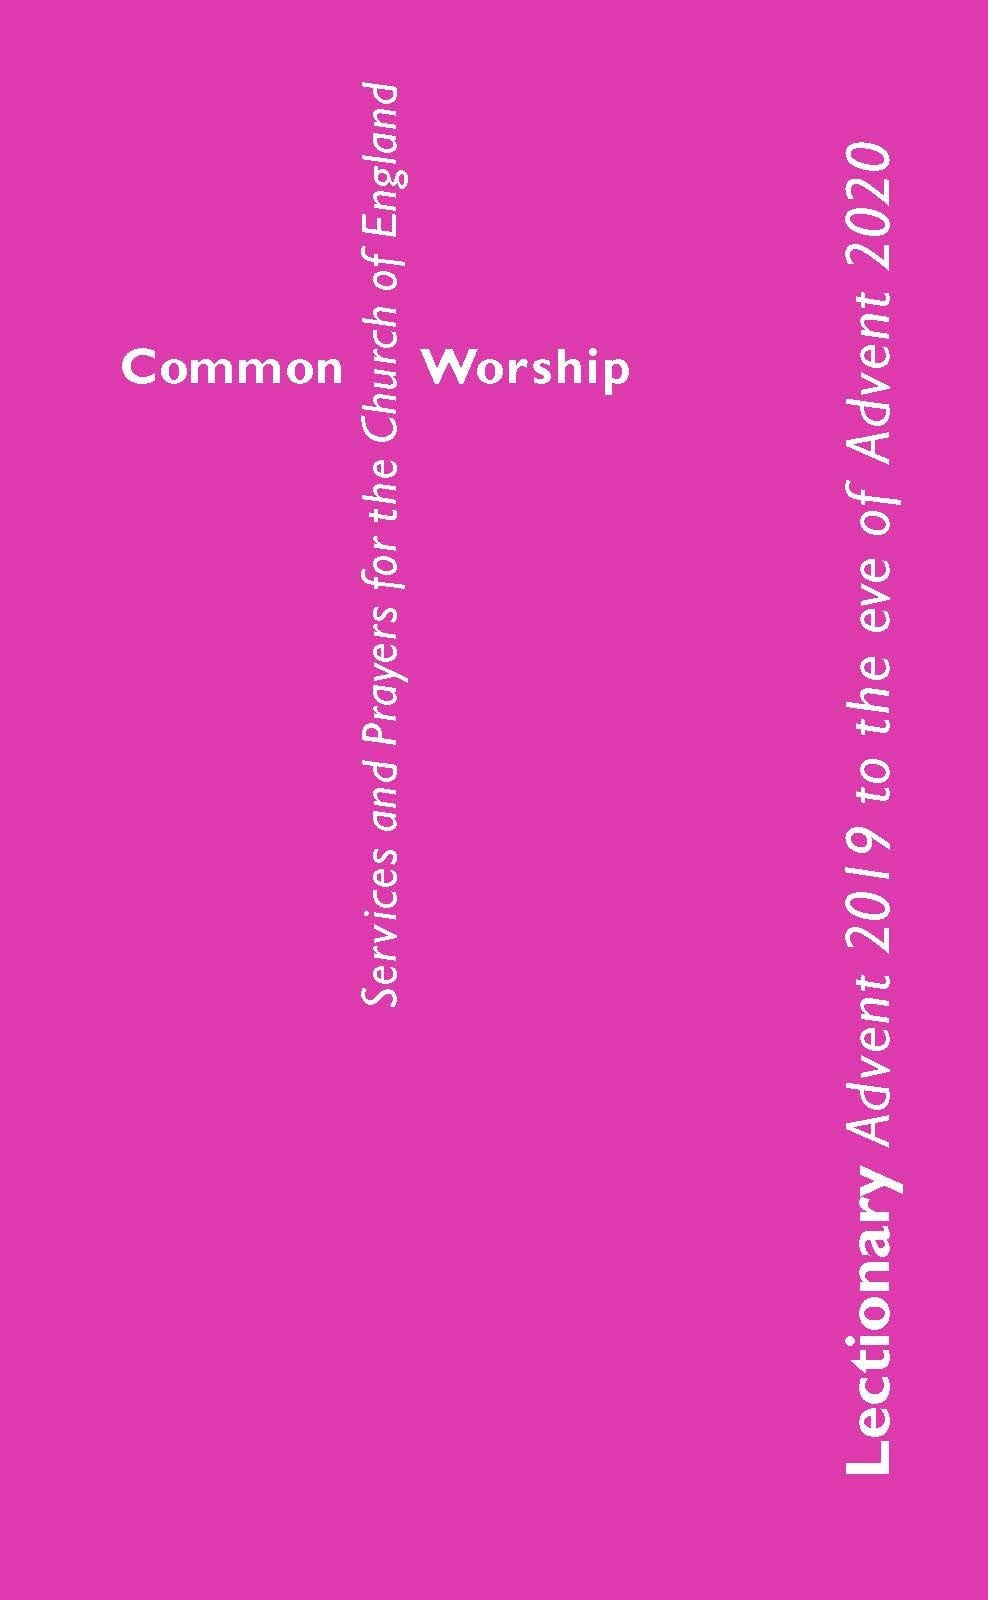 Liturgical Calendar 2020 Methodist - Template Calendar Design  United Methodist Church Lectionary Preaching 2021